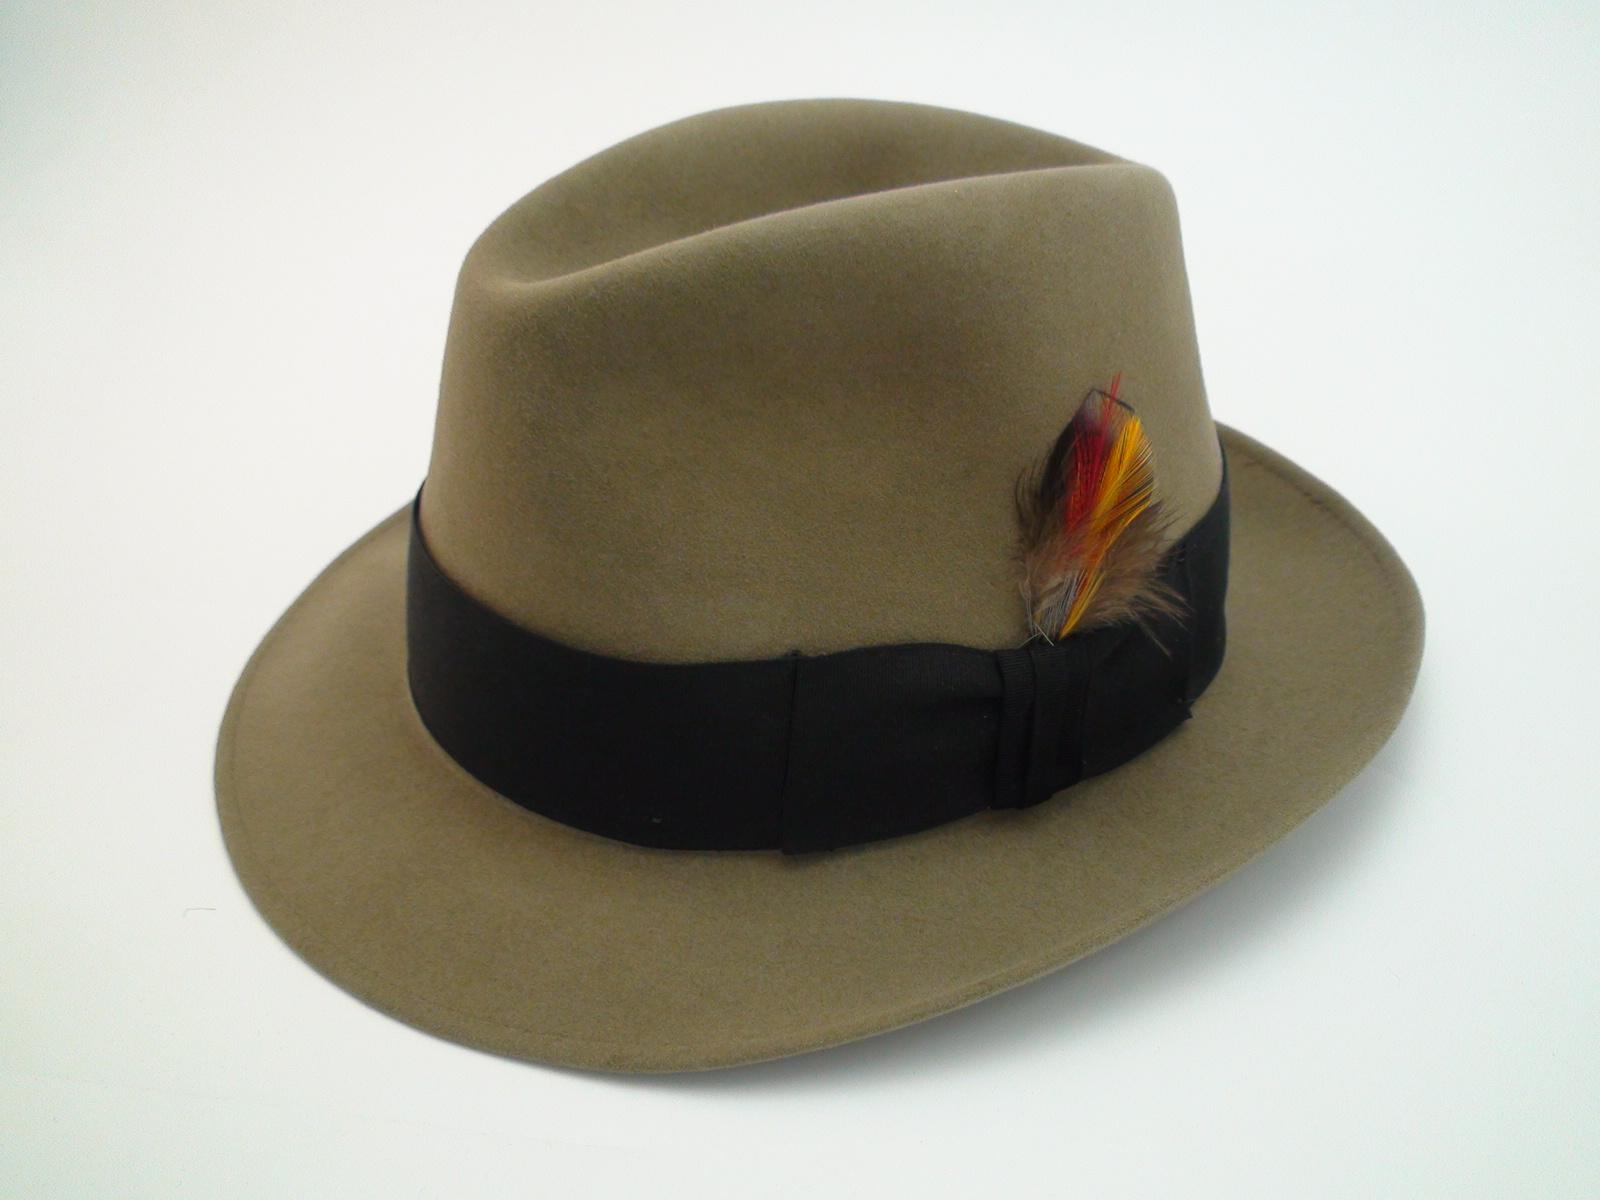 Vintage Royal Stetson Saxon Bark Color Fur Felt Fedora Hat 1b97e79ebd17